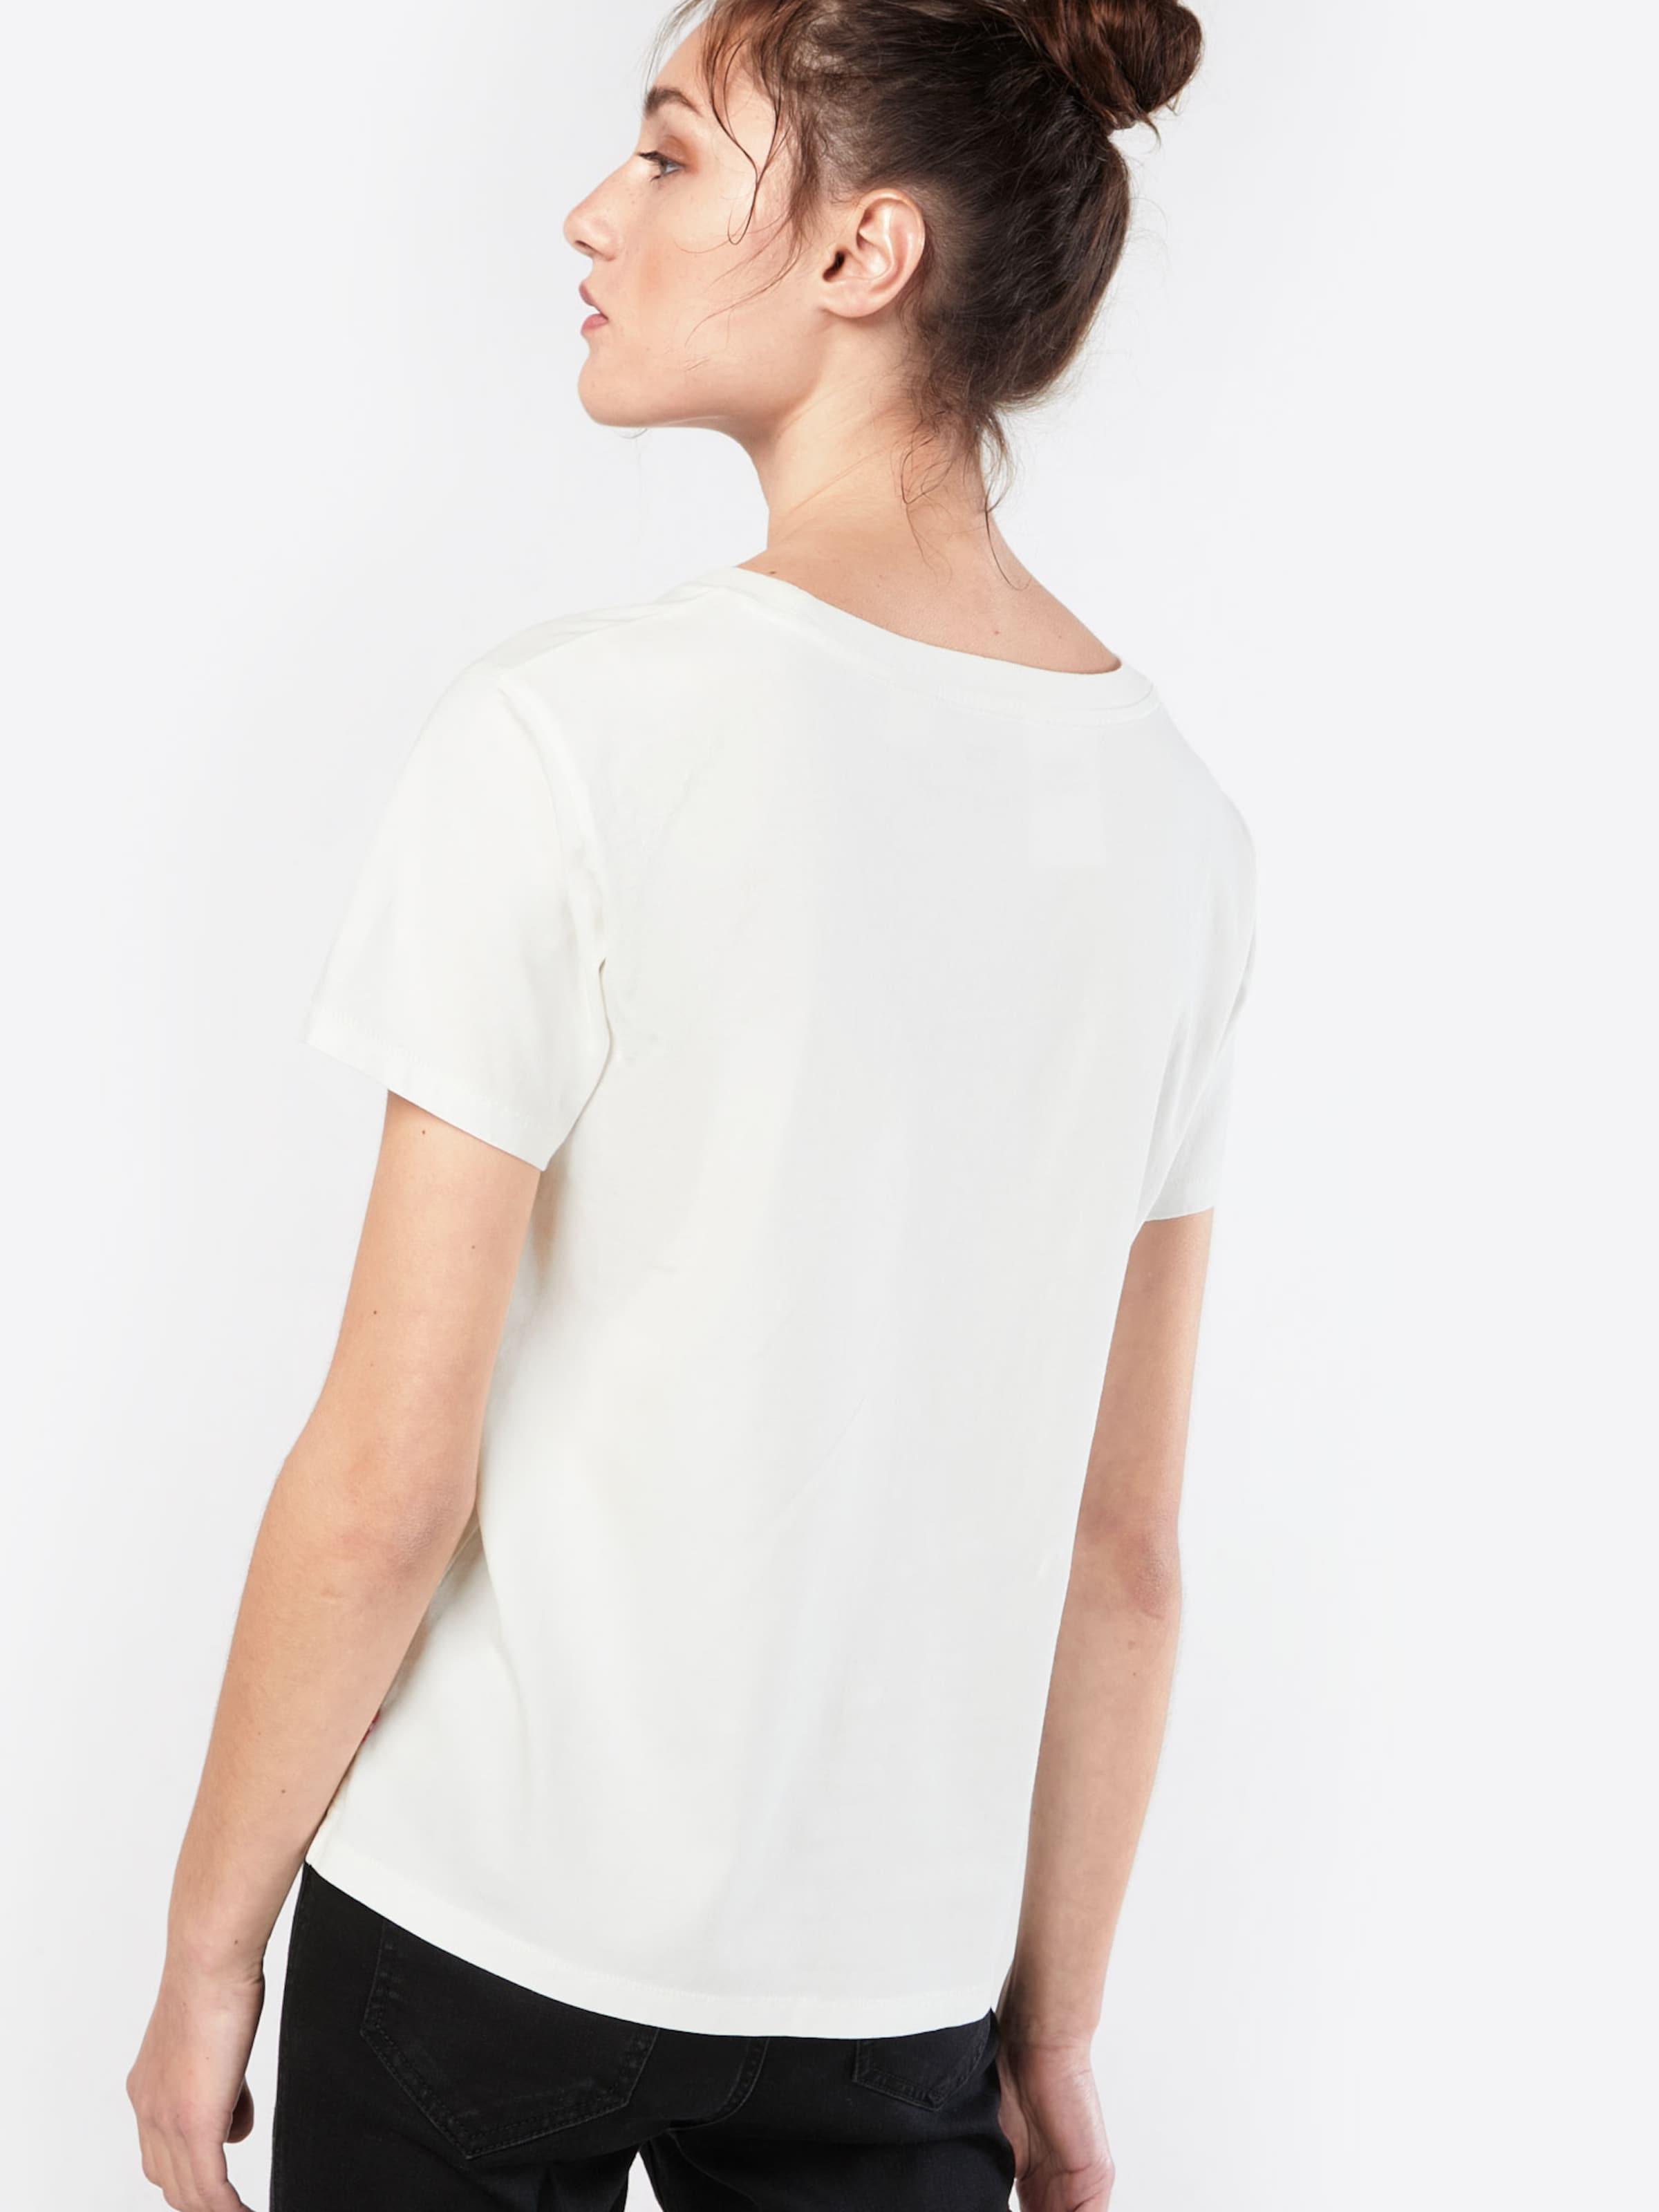 LEVI'S T-Shirt 'GRAPHIC J.V.' Unter Online-Verkauf su2LT4eVd